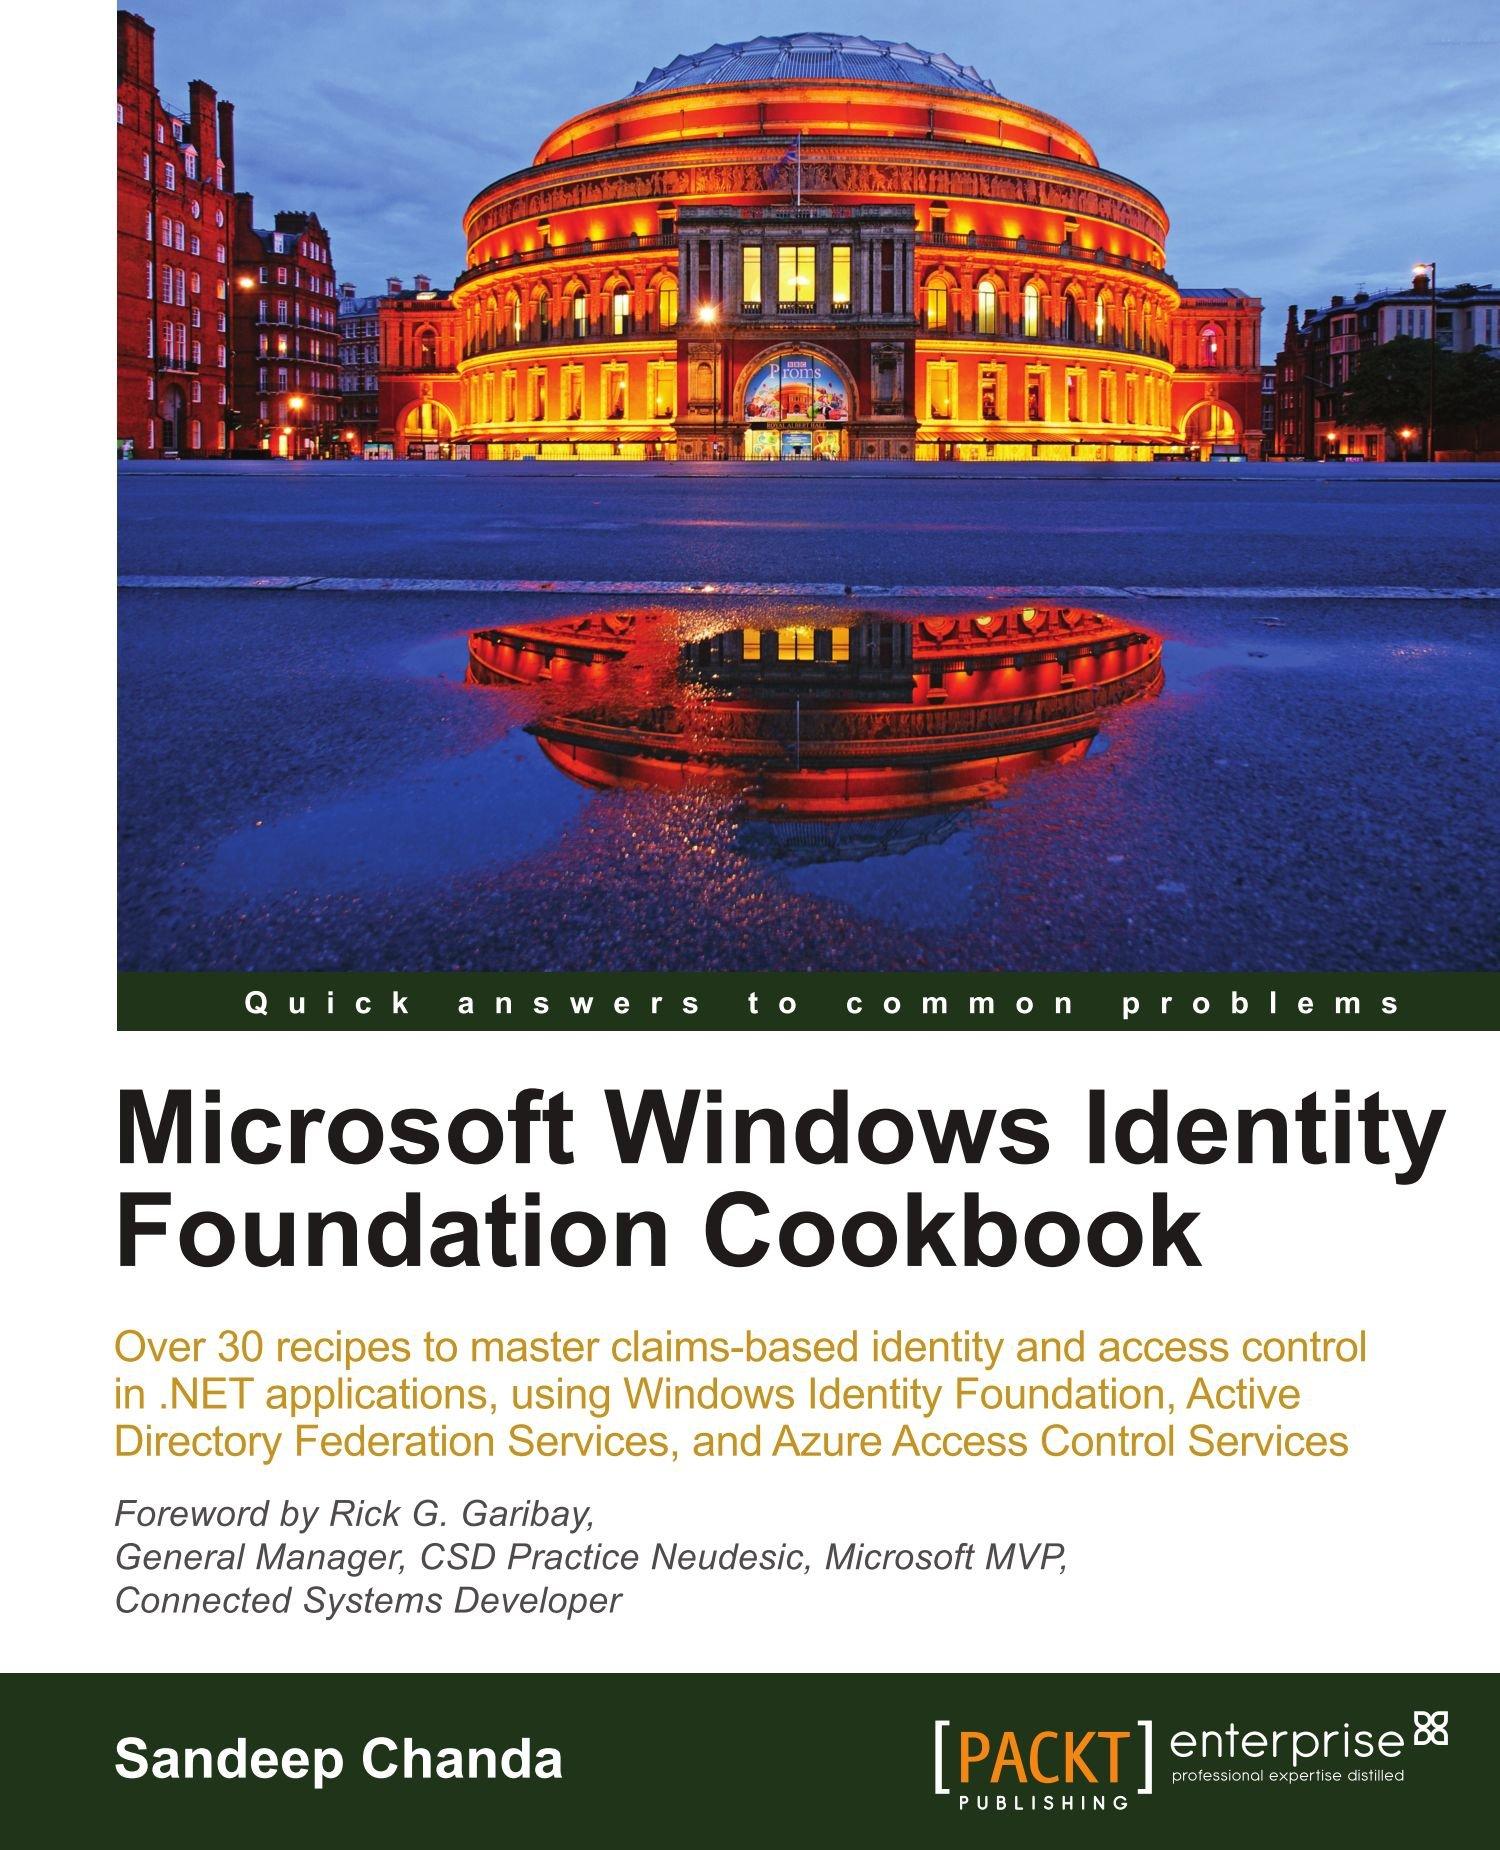 Microsoft Windows Identity Foundation Cookbook pdf